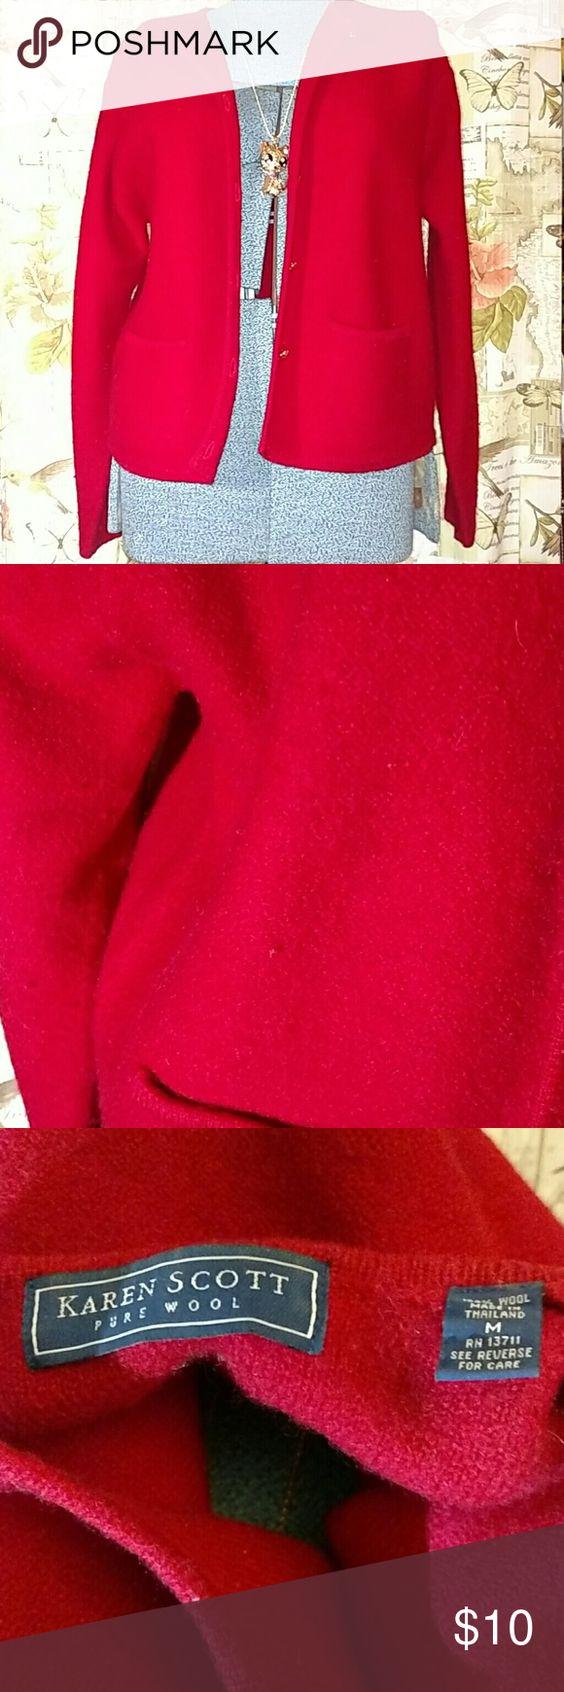 Karen Scott pure wool sweater Typical pilling in wear areas Karen Scott Sweaters Cardigans